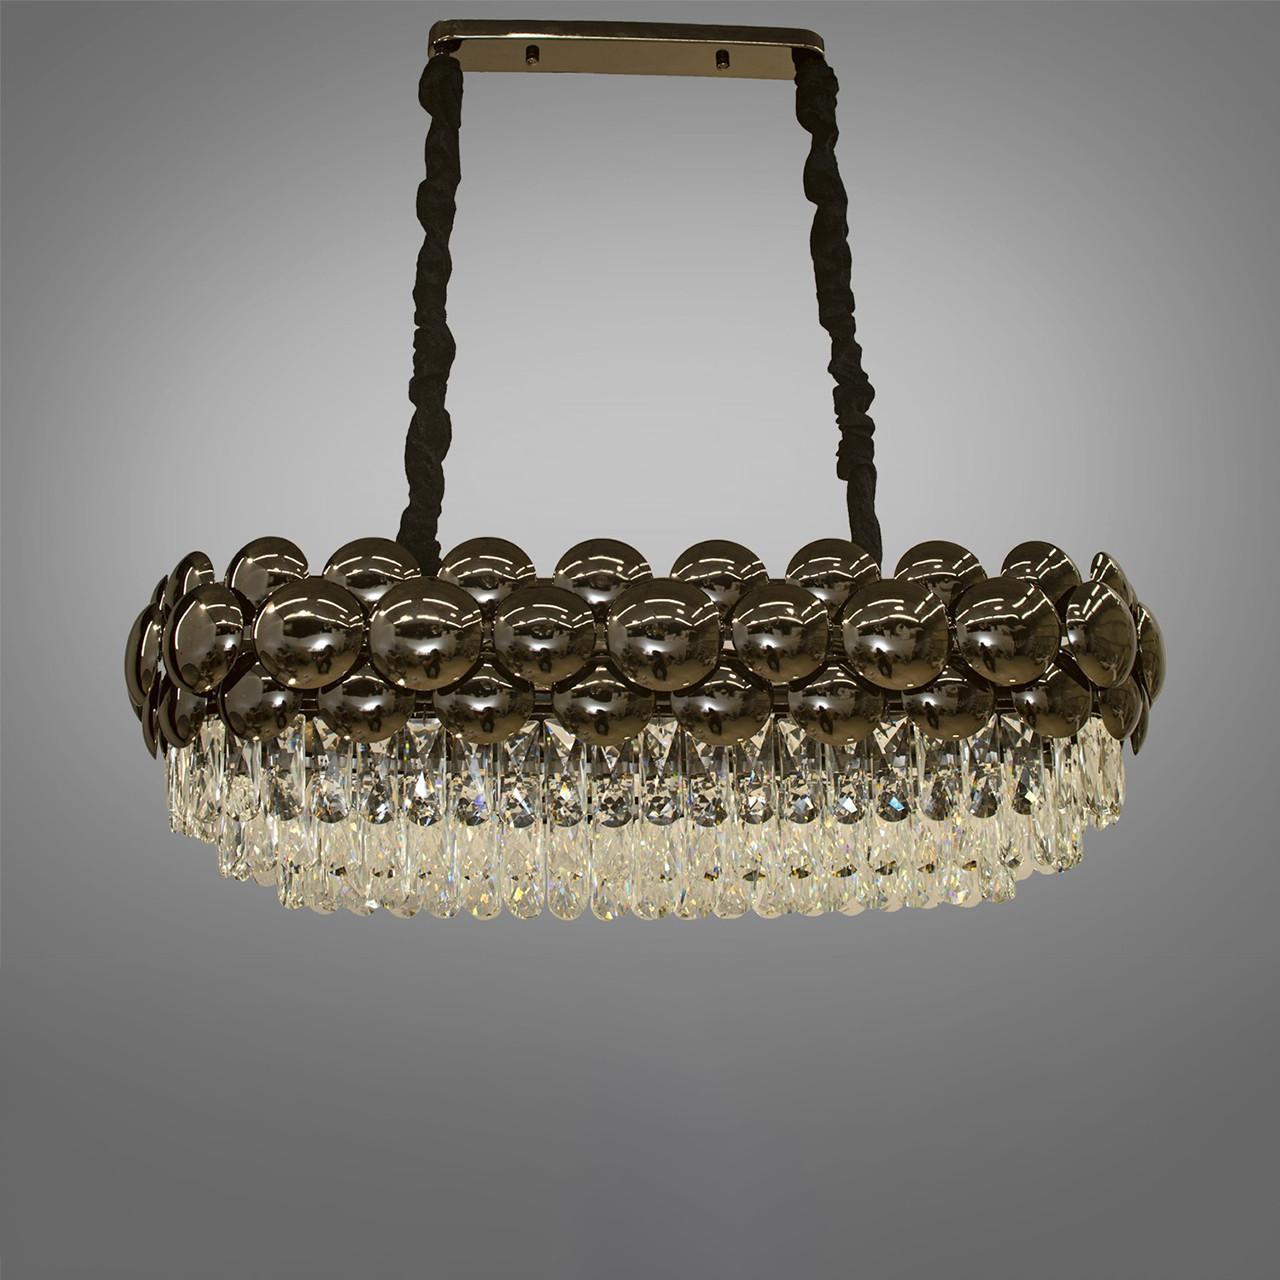 Овальна кришталева люстра на ланцюгу в стилі Арт-Деко каркас хром 85*85 см на 10 ламп Е14 D-QS7719/800x350BHR